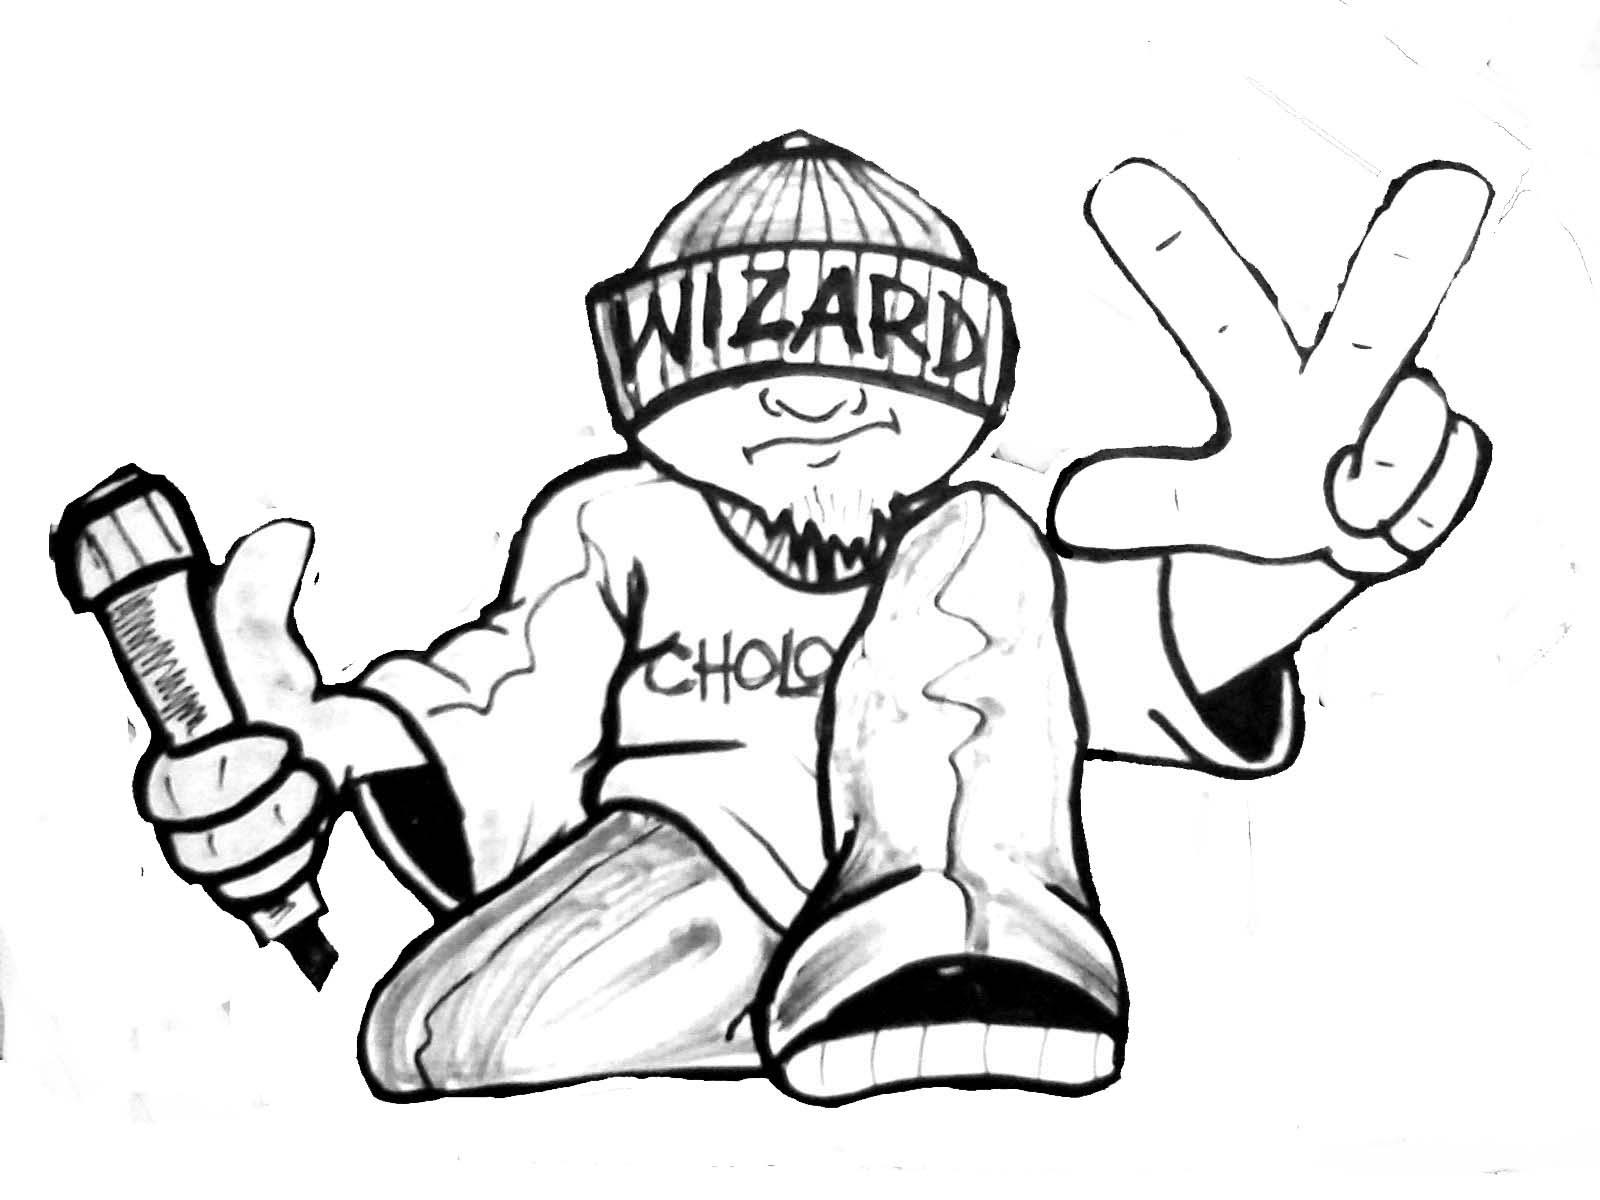 1600x1200 Graffiti Karakter Gangsta Drawing A Cholo Character (By Wizard